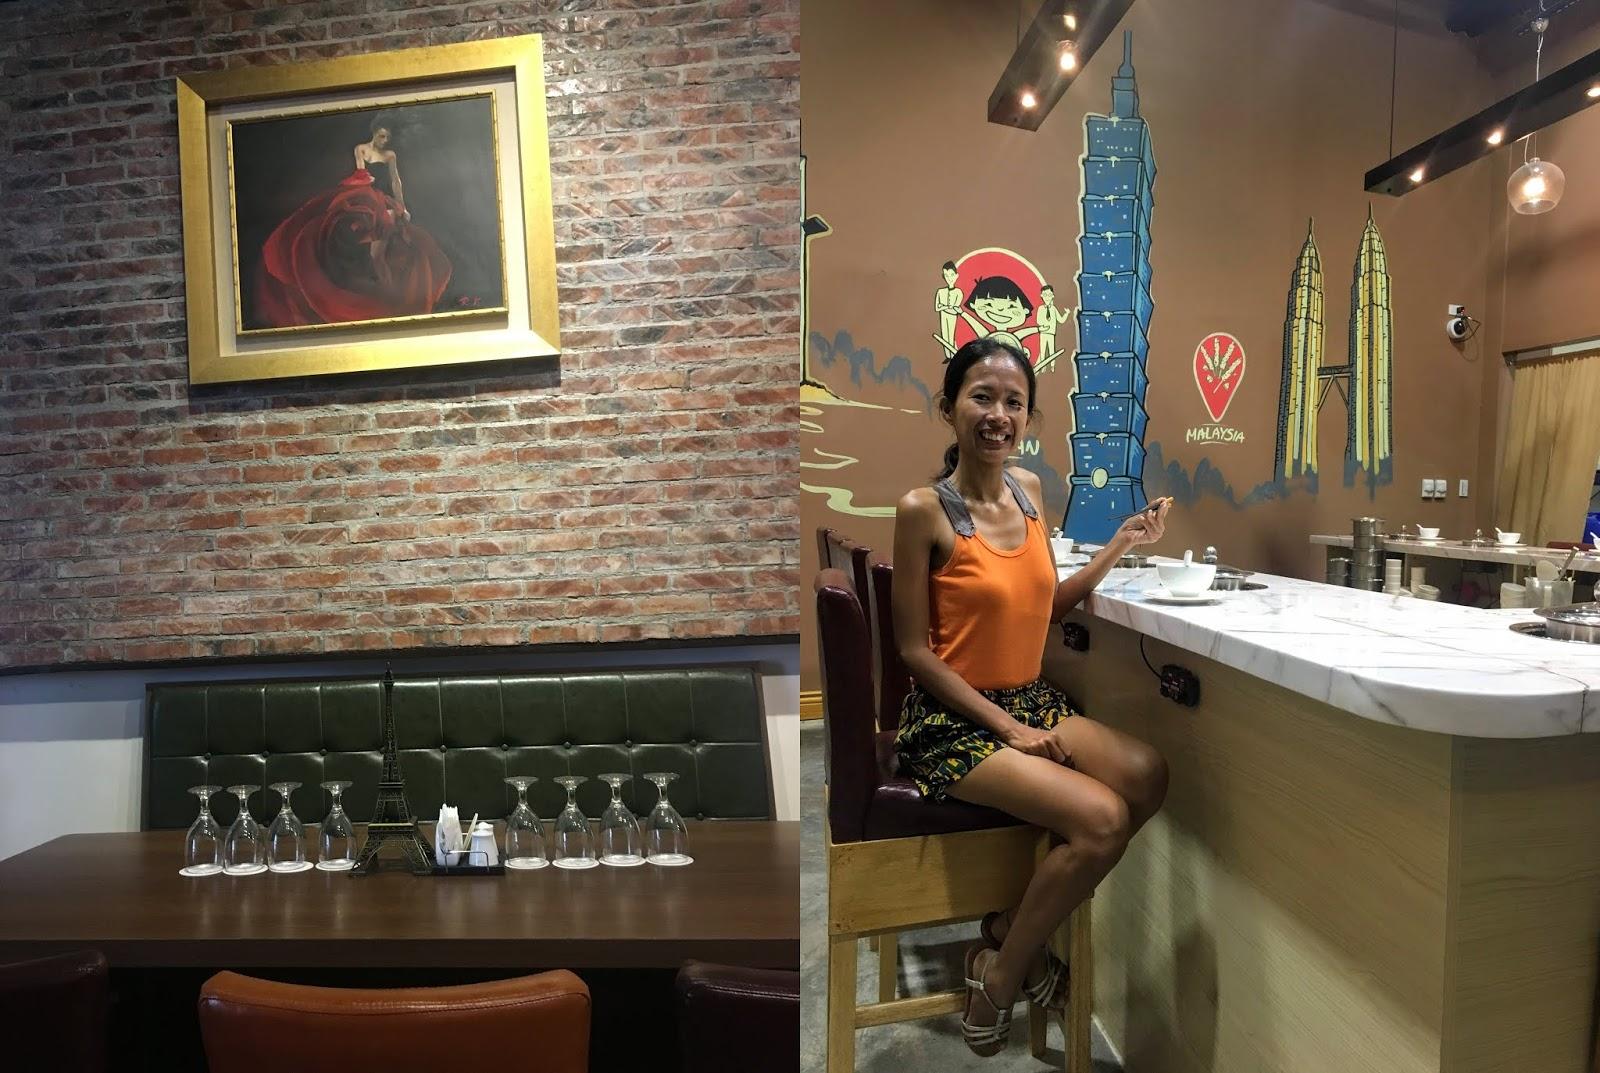 shabu shabu restaurant in subic bay